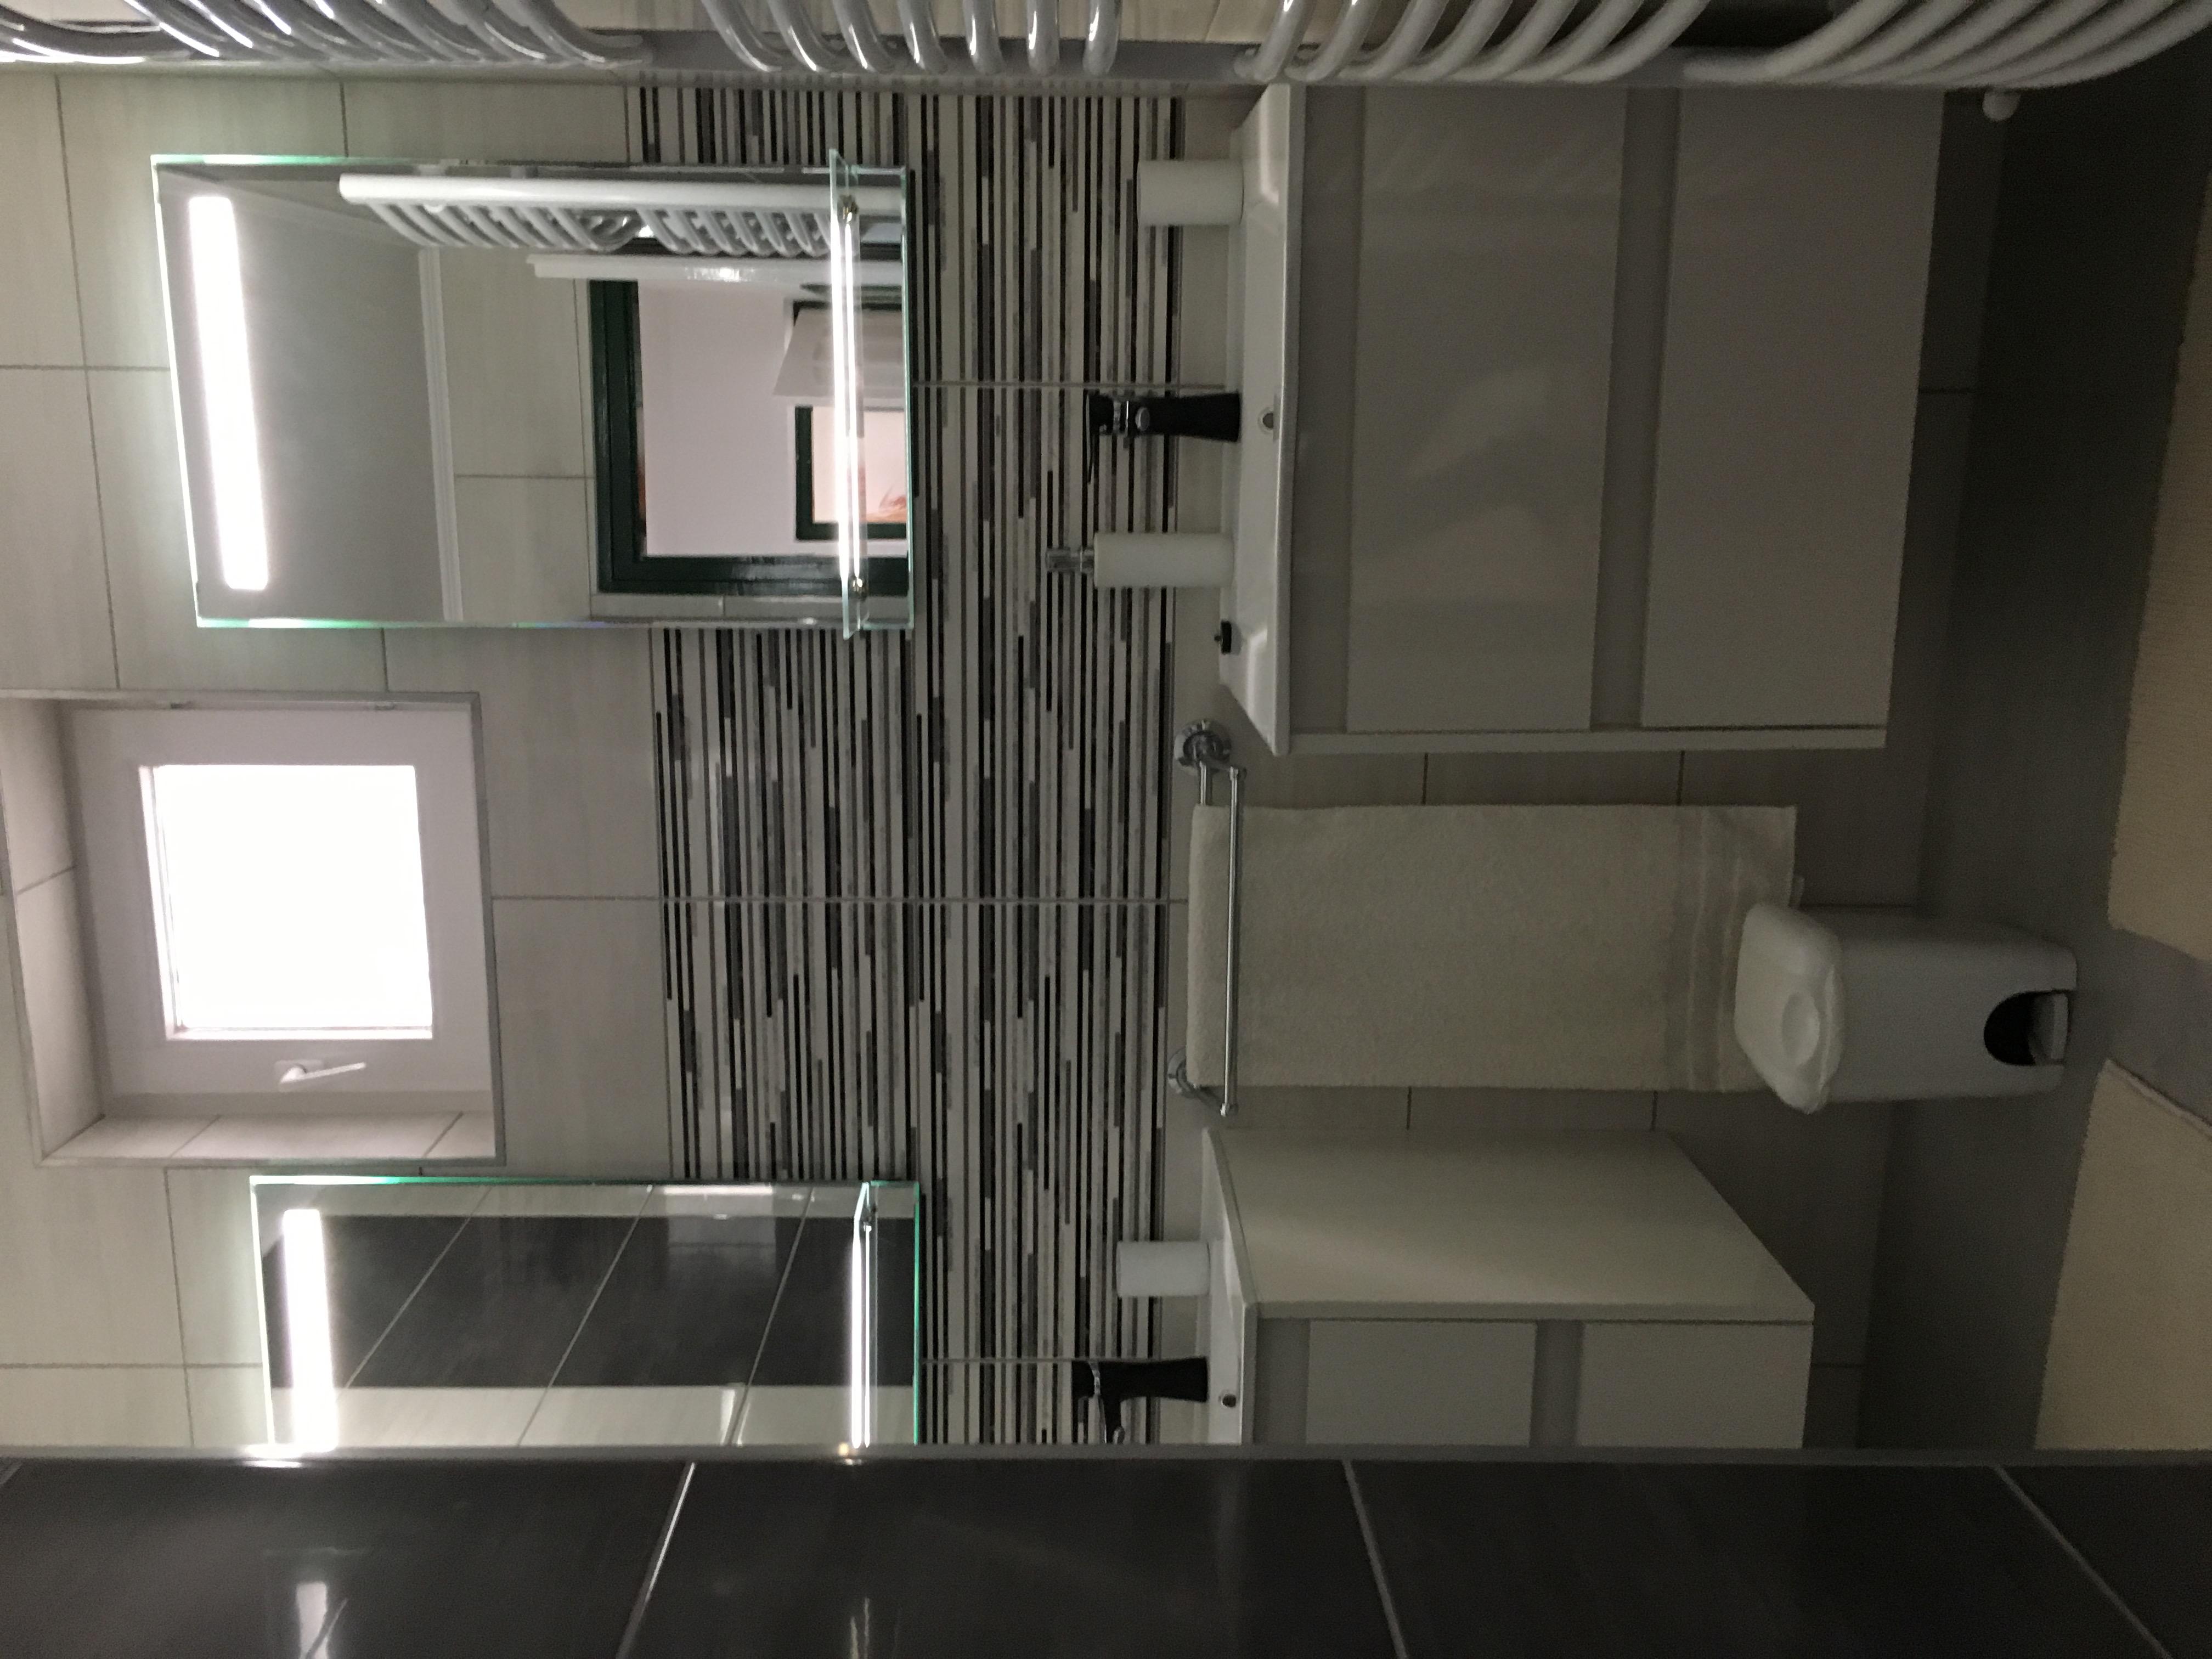 Kirandulastervezo-Sarospatak-Iskolakert-Apartman-11.JPG